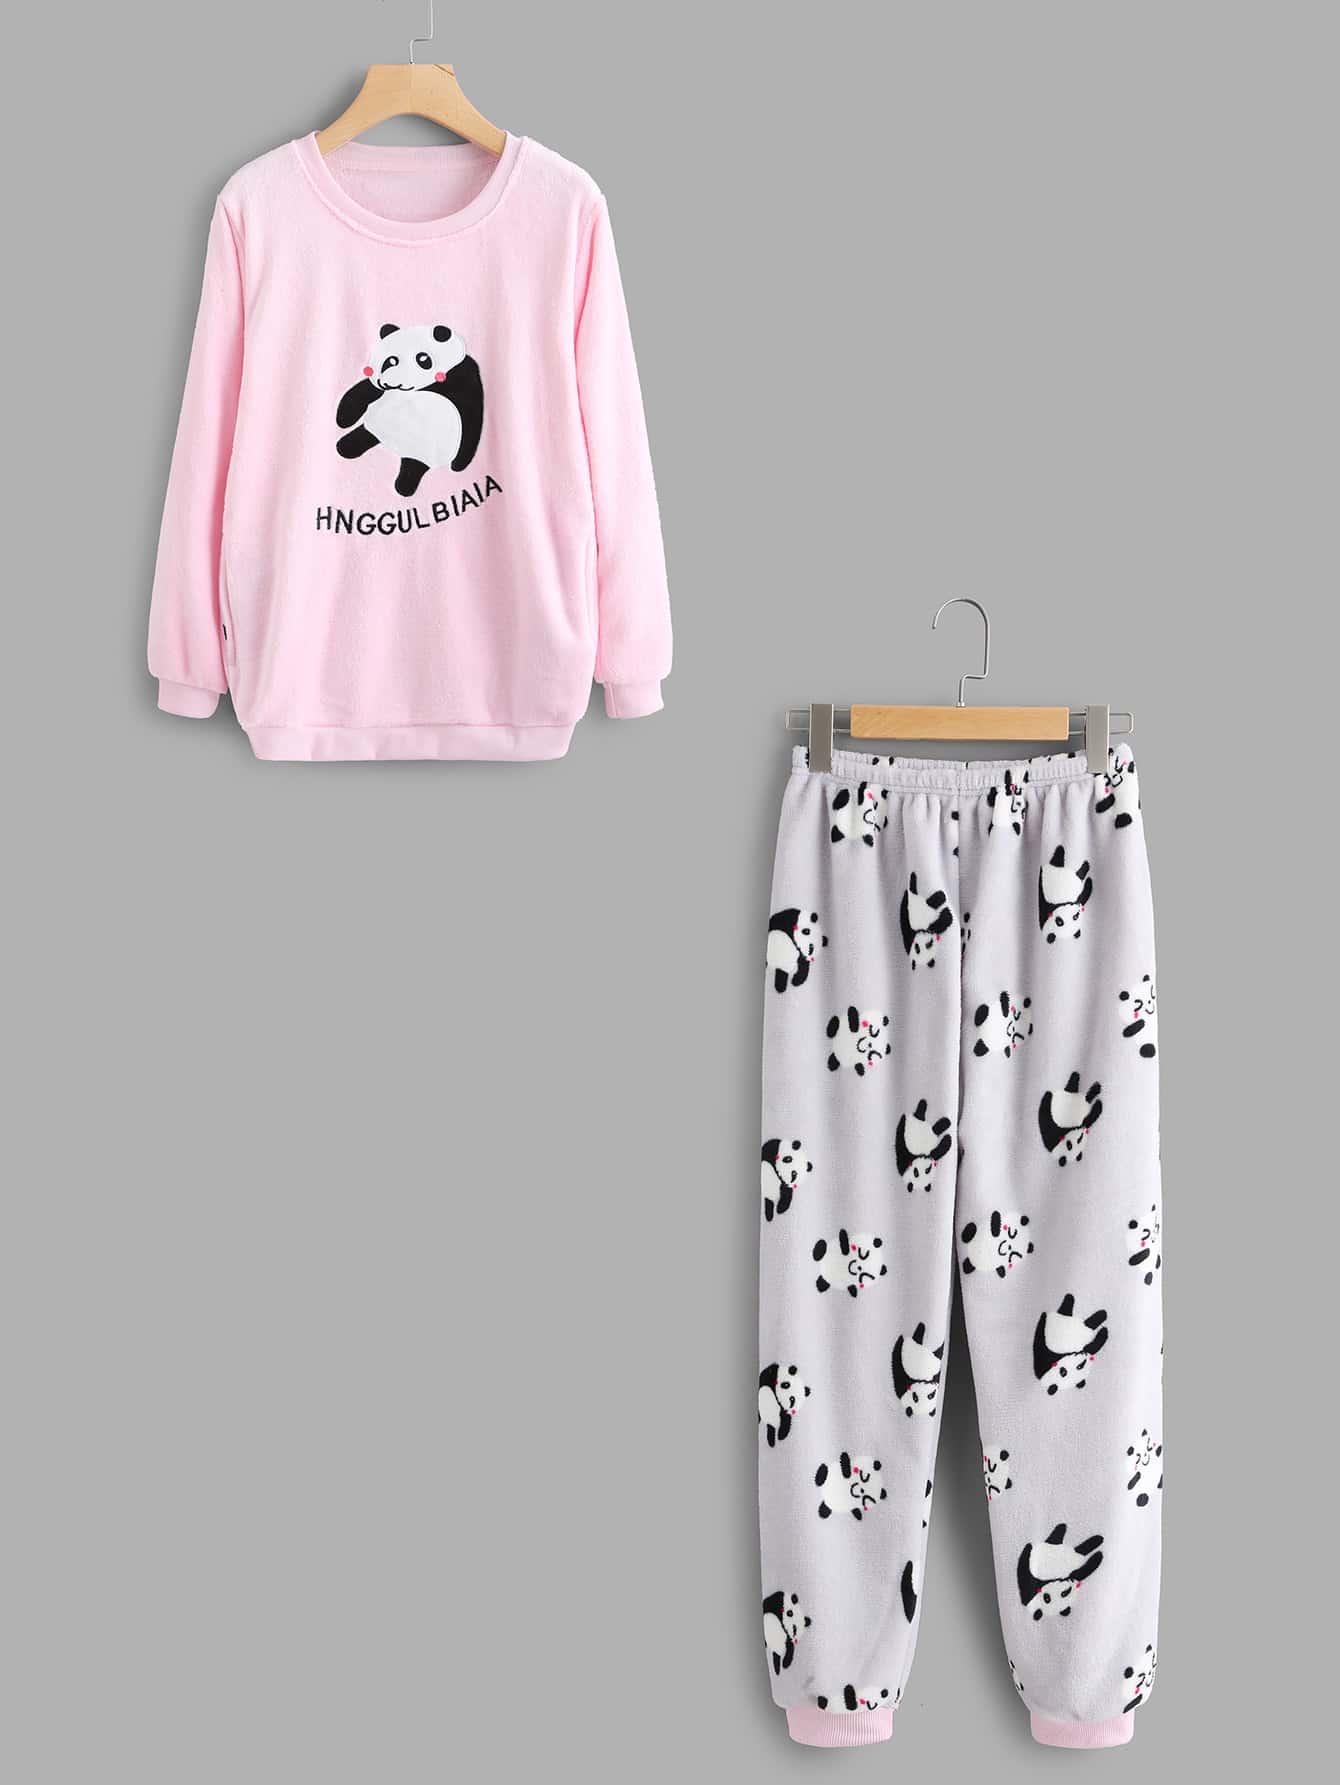 Panda Print Pajama Top And Pants